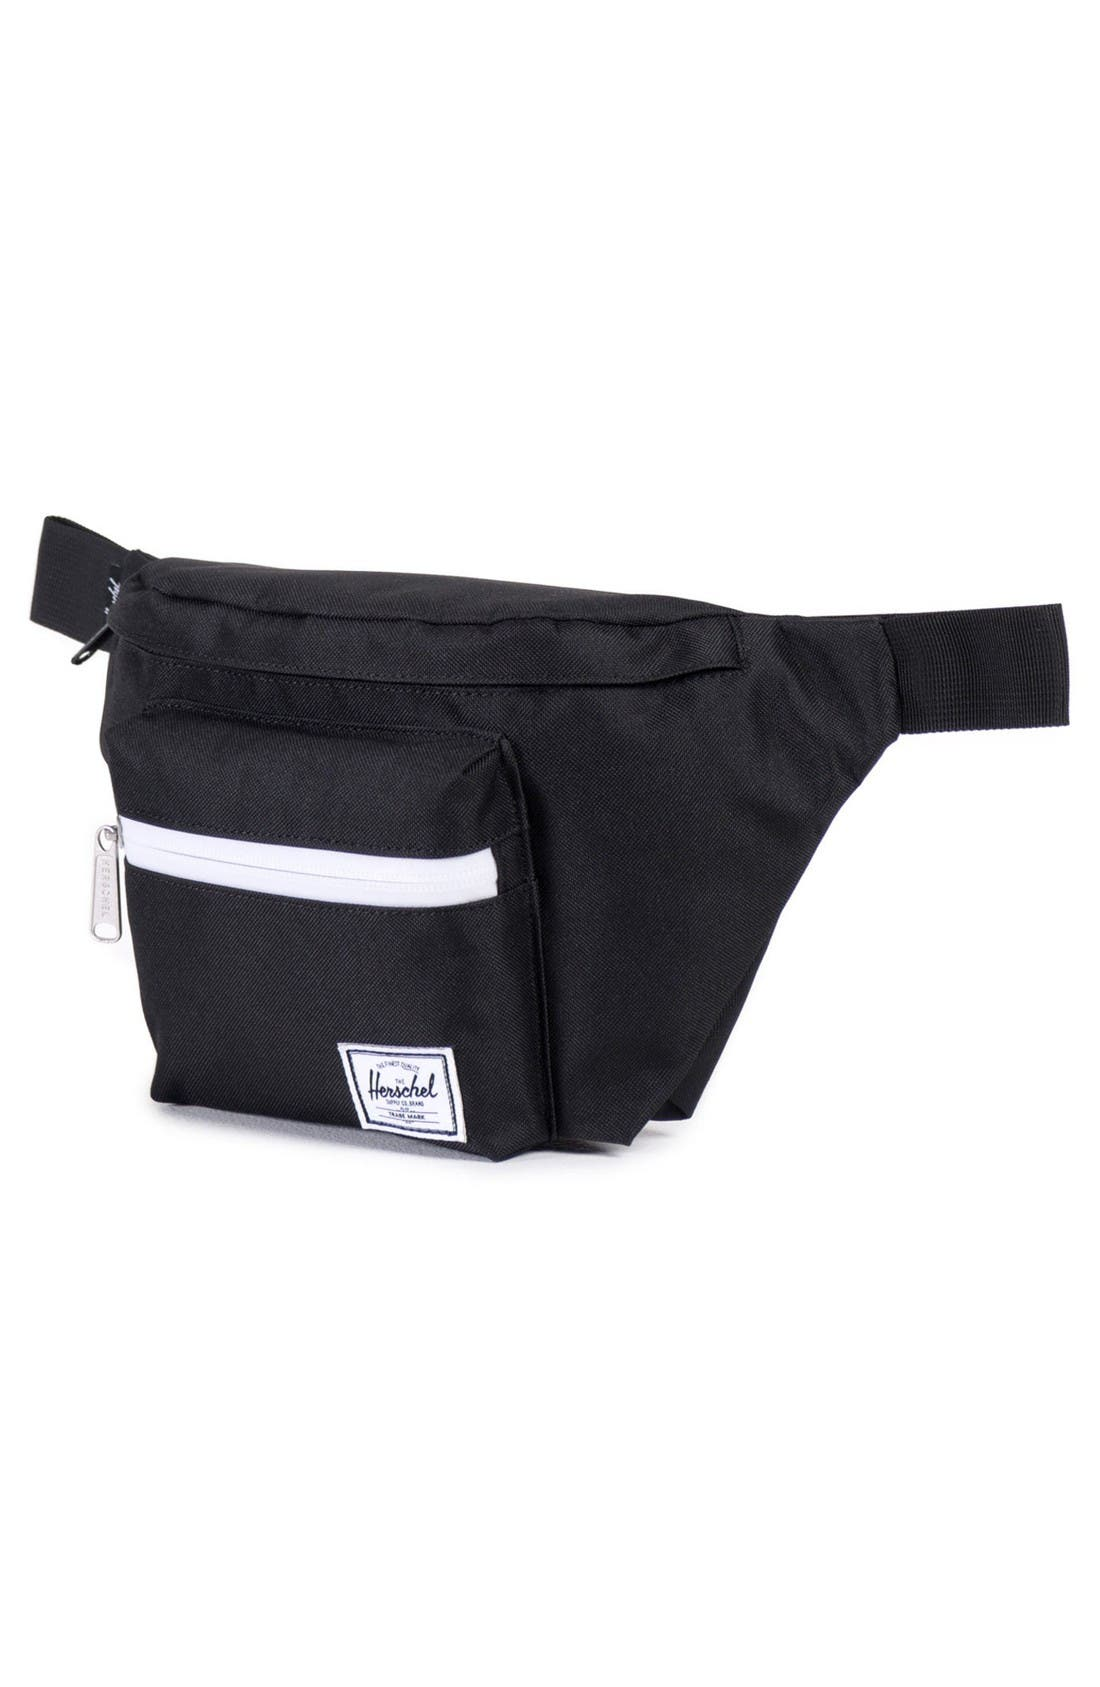 'Seventeen' Belt Bag,                             Alternate thumbnail 3, color,                             Black